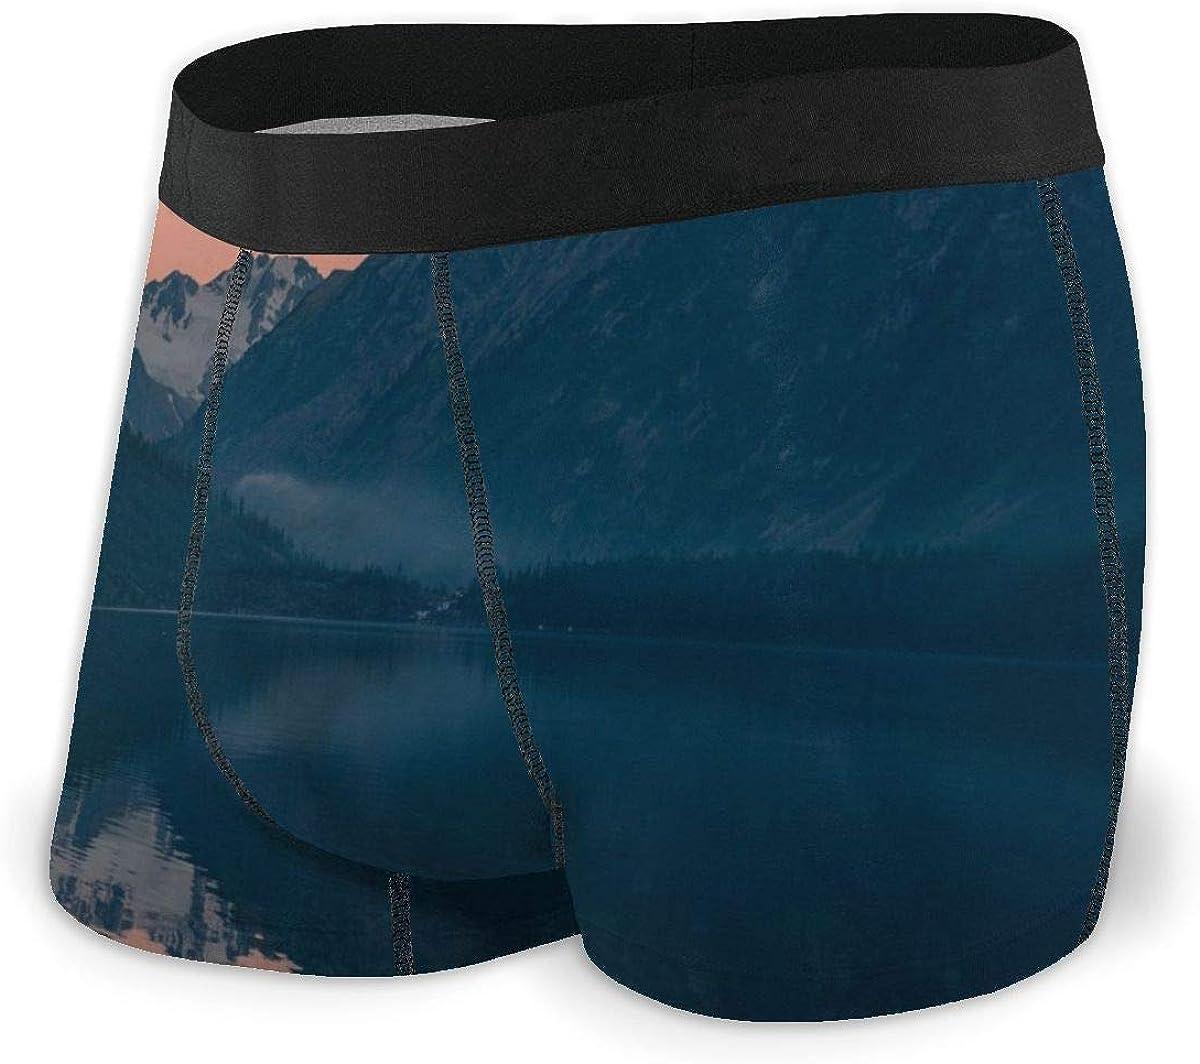 Randolph Wordsworth Mens Boxer Briefs Special Landscape Bikini Underwear Stretch Low Rise Trunks Boys